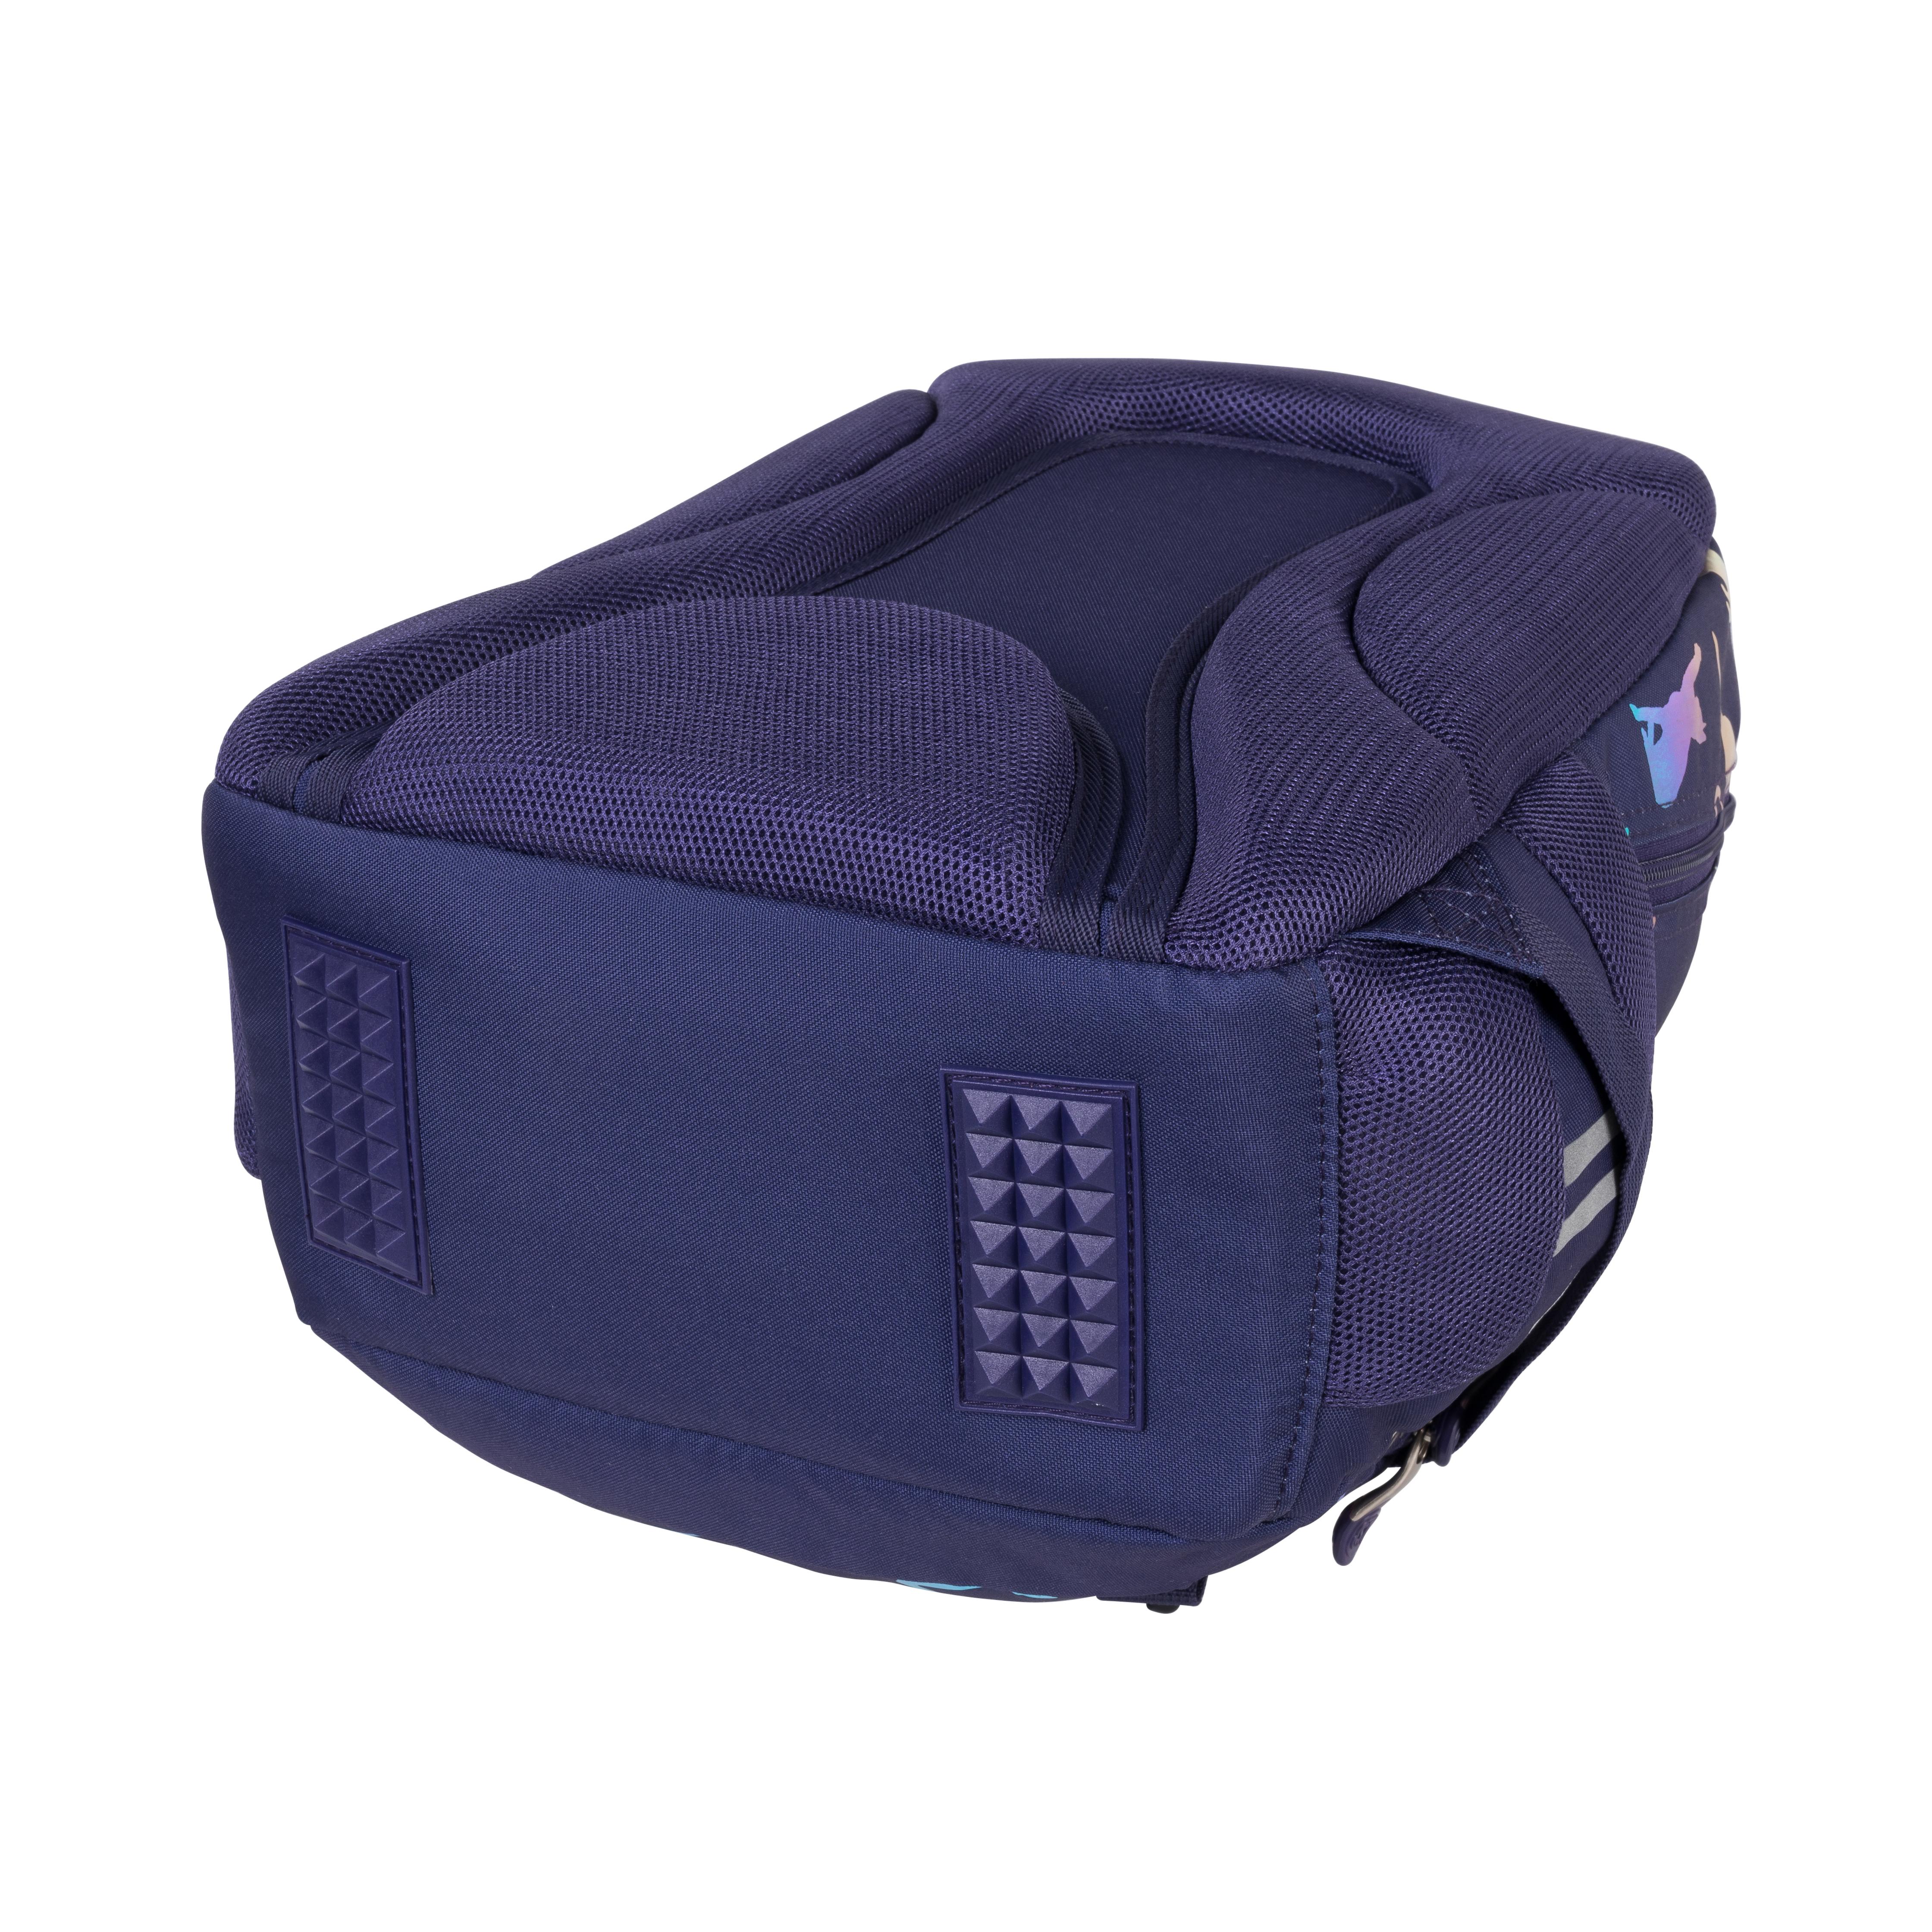 Plecak 3-komorowy BP26 Holo Cats/Holo Kotki